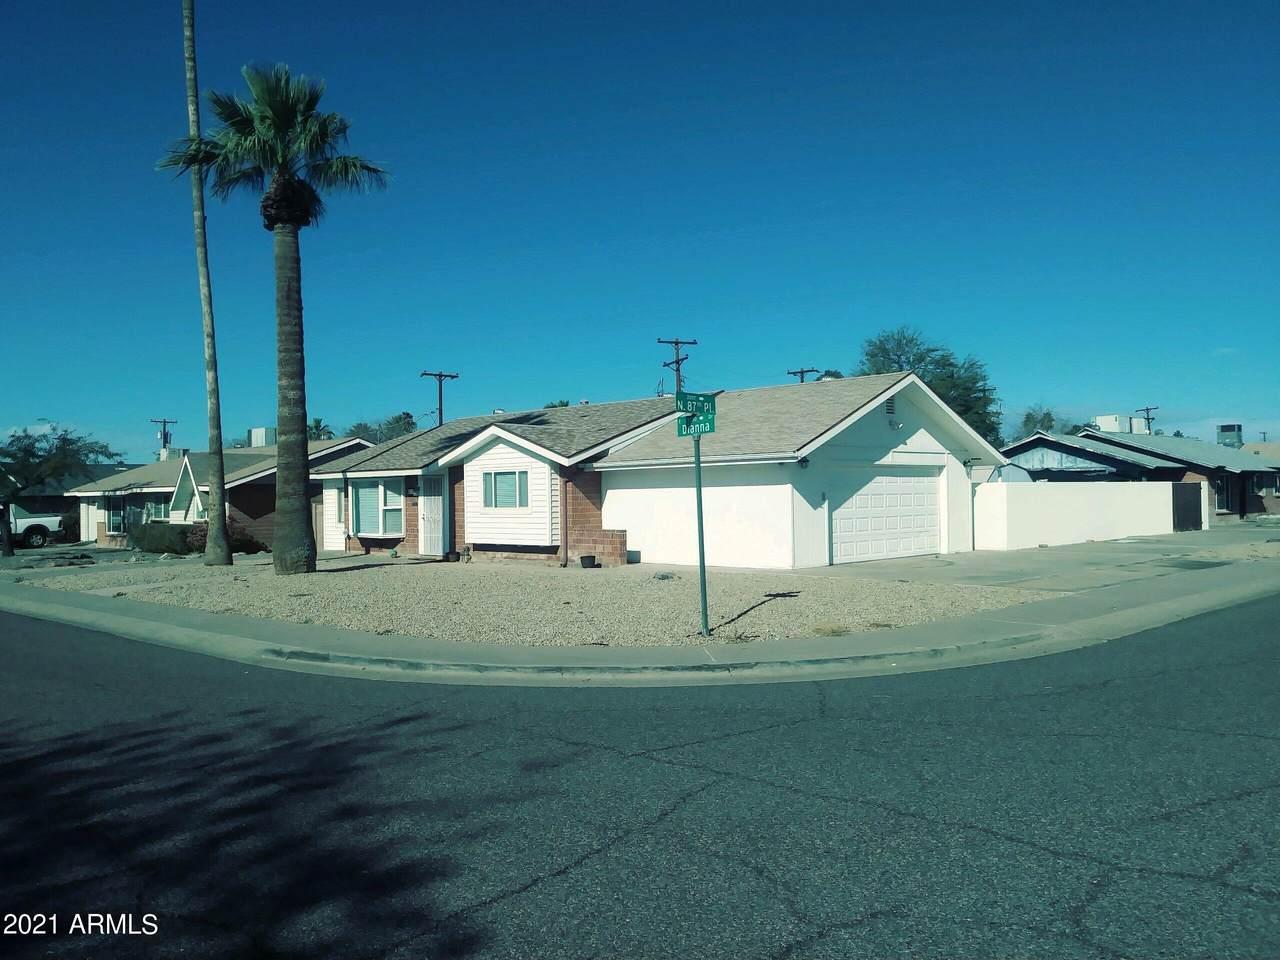 8742 Dianna Drive - Photo 1